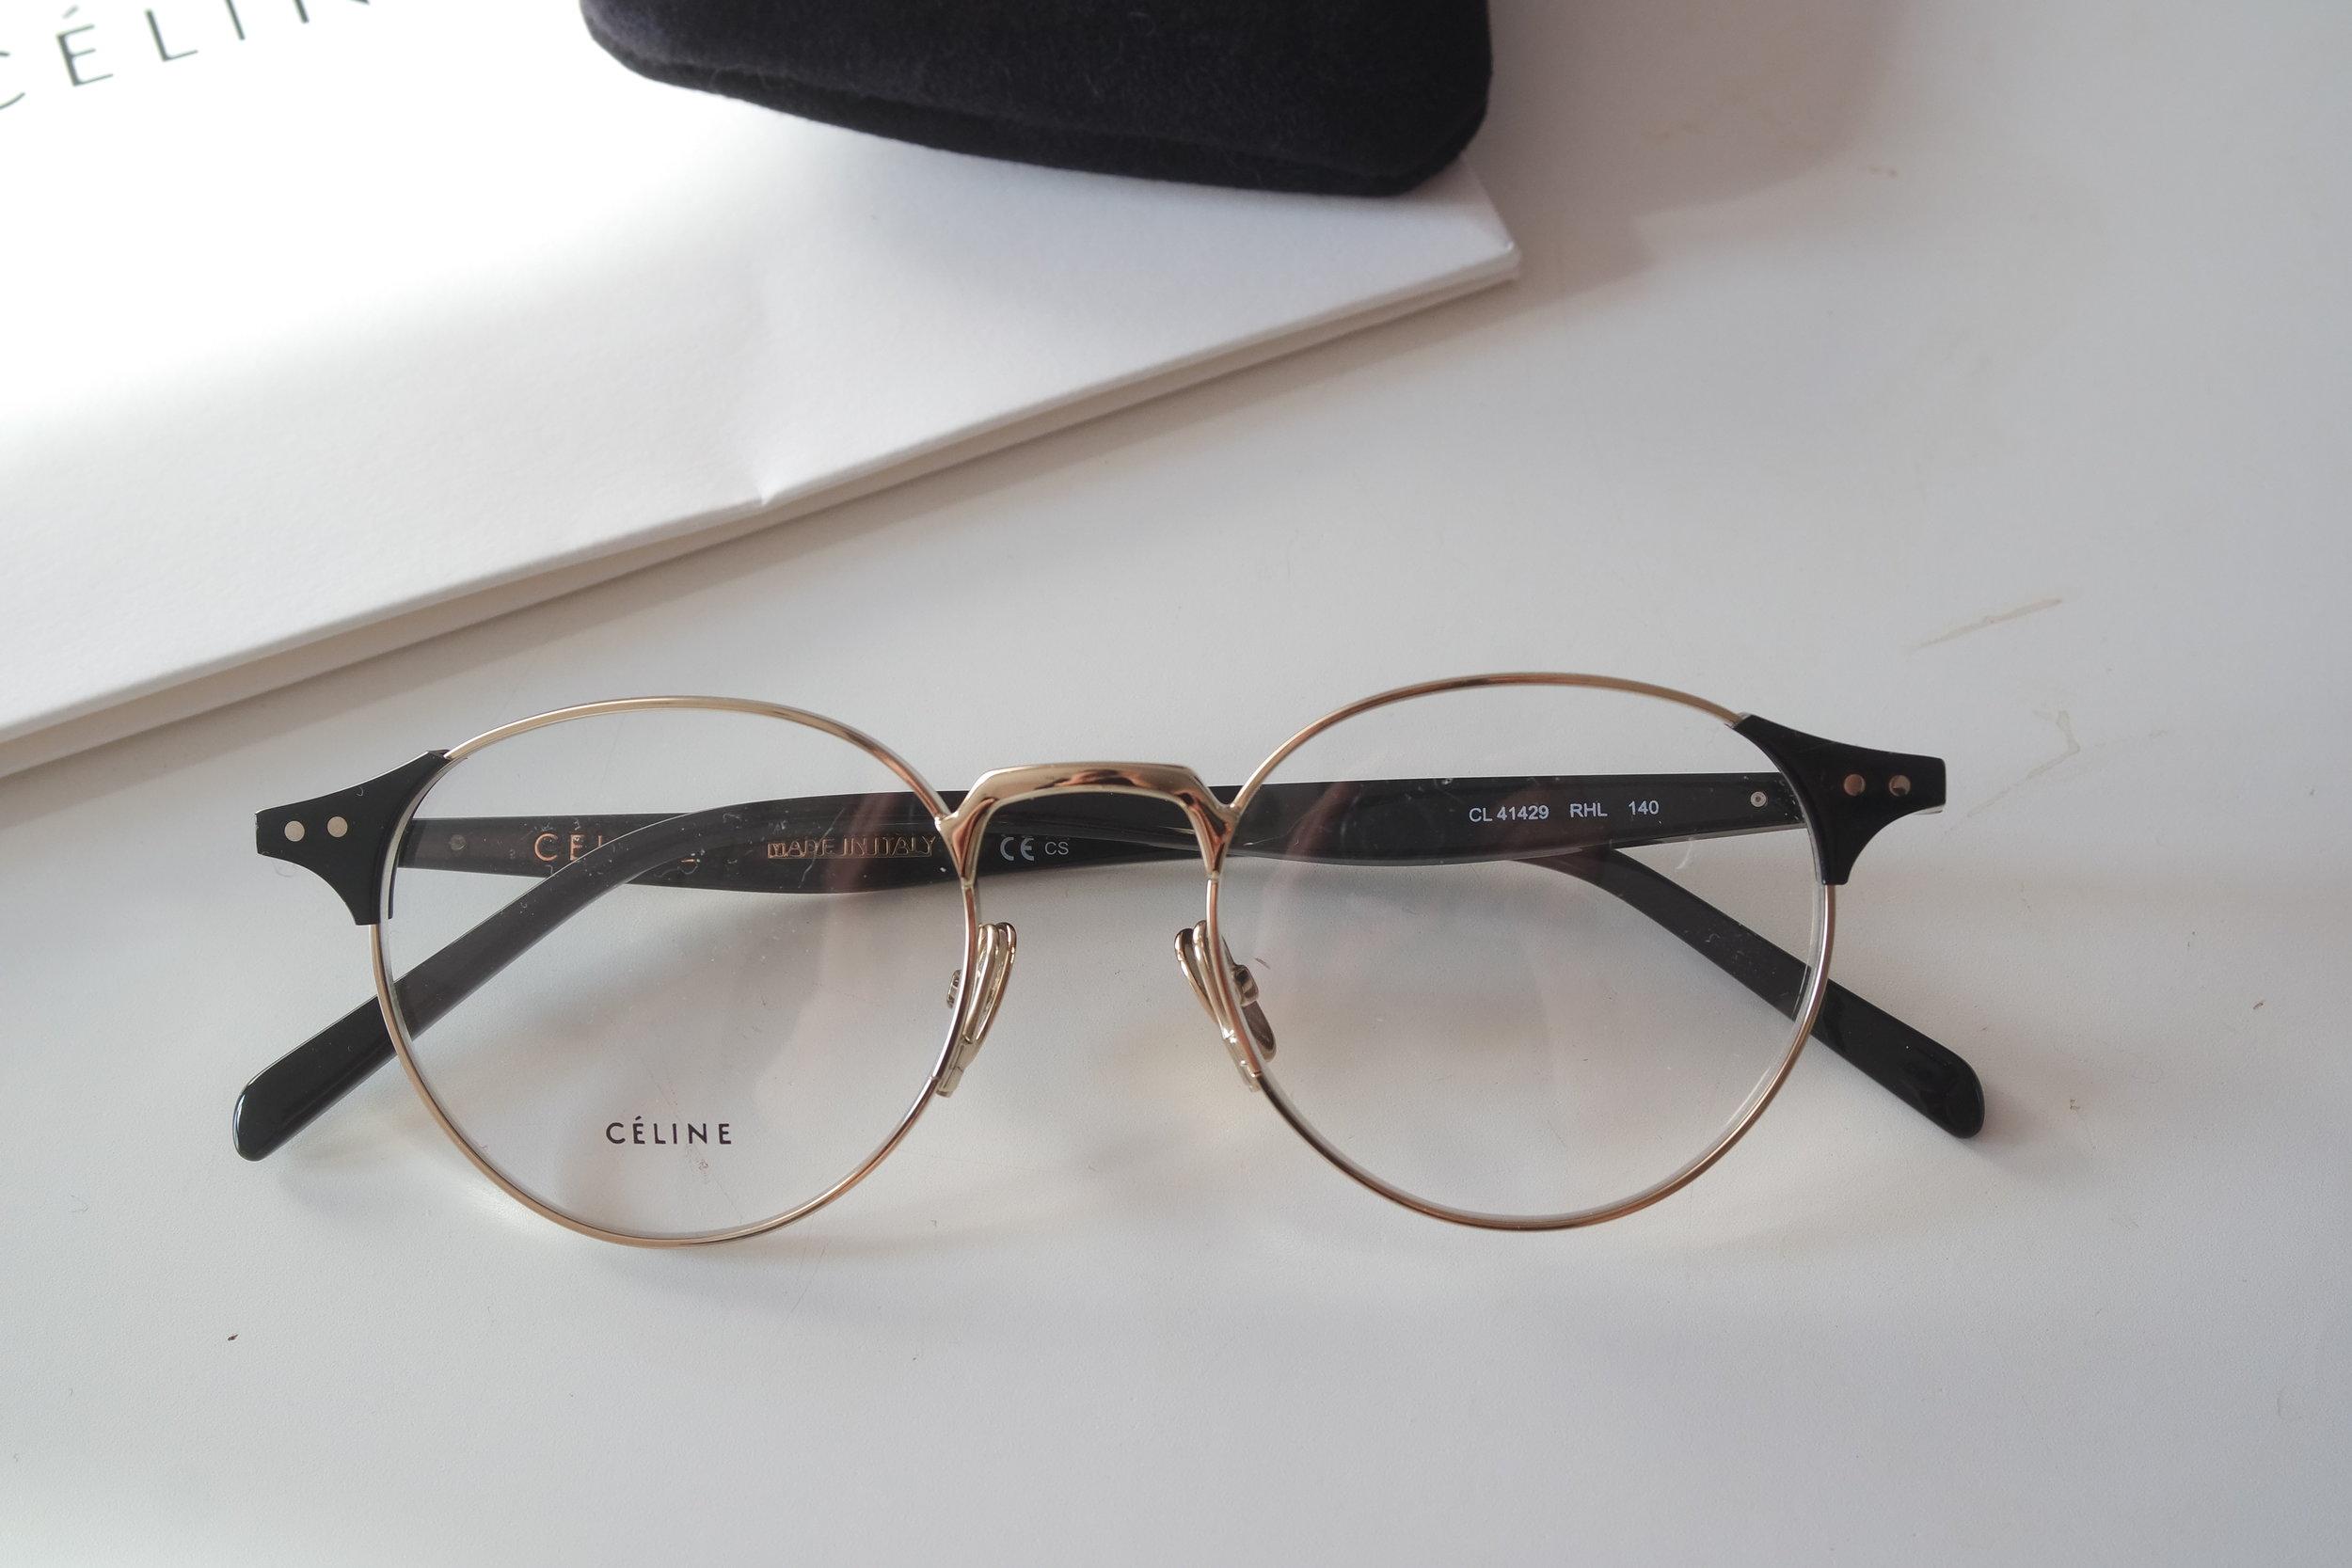 034686b3f8a7 Celine 41429 Gold Metal Round Eyeglasses Frames — Designer Daydream